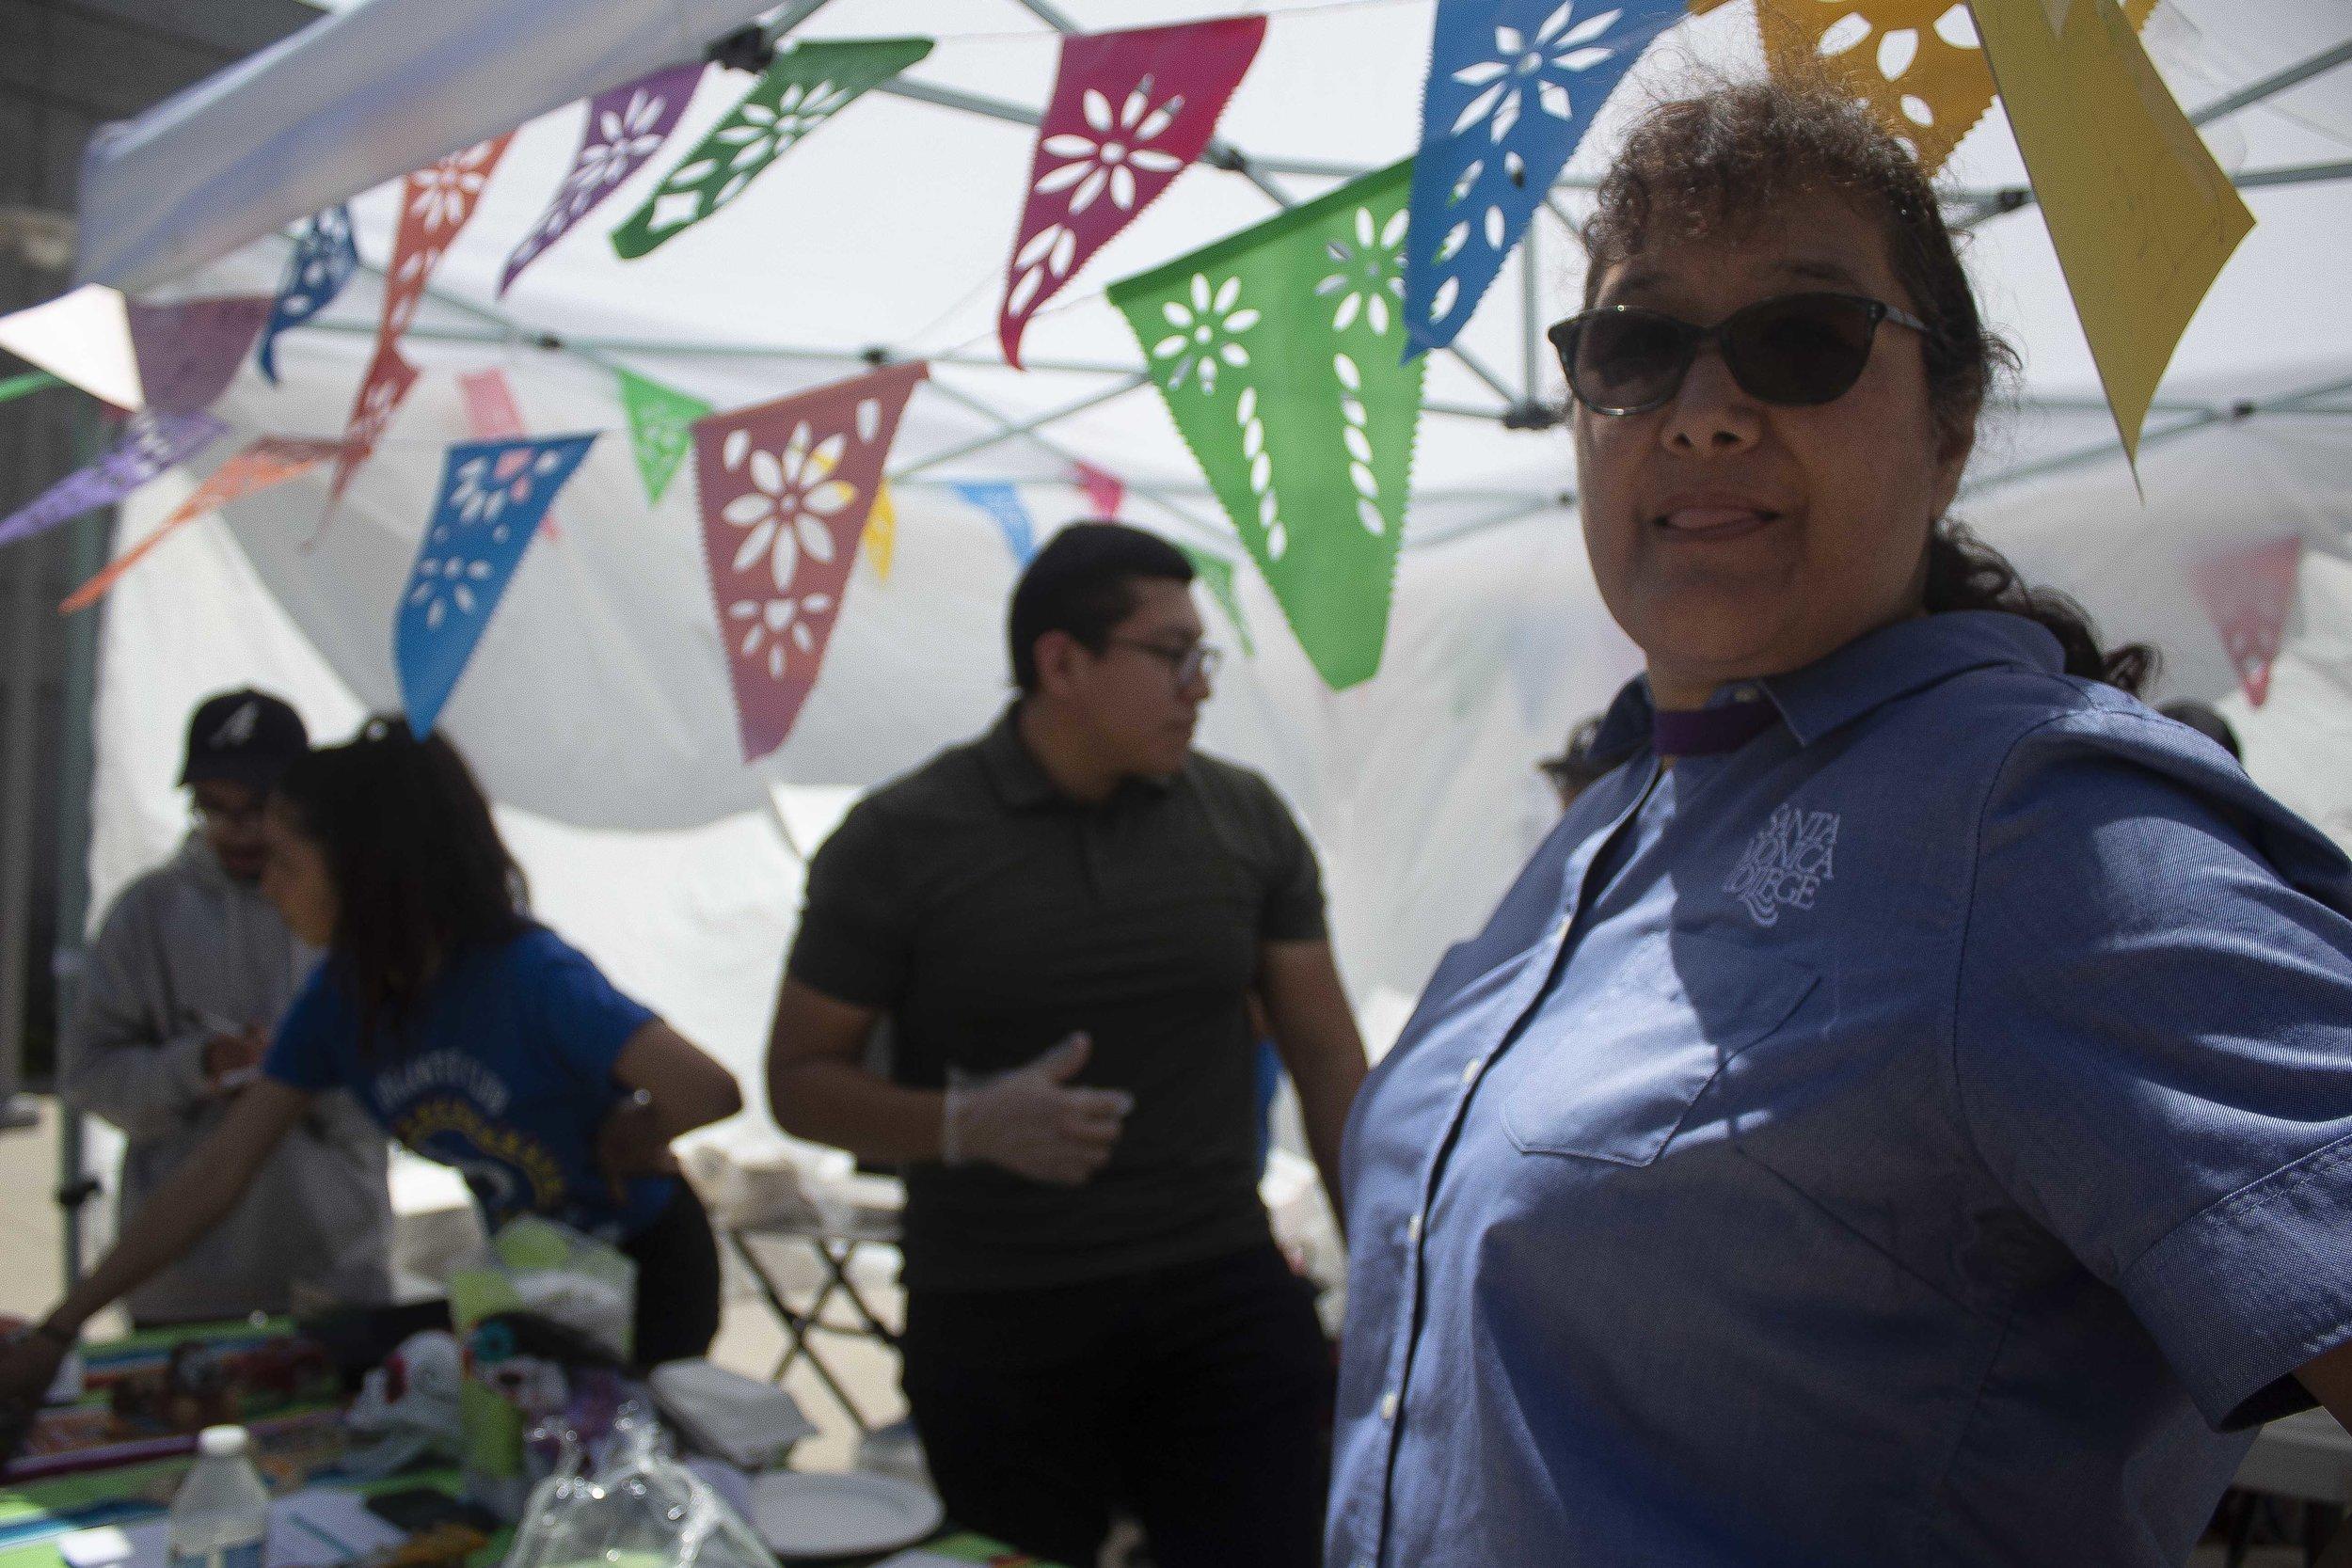 Maria Martinez, advisor of the ADELANTE Program, serves tacos at their booth during the Santa Monica College (SMC) College Fair. April 23, 2019. (Pablo Eden Garcia/ The Corsair)